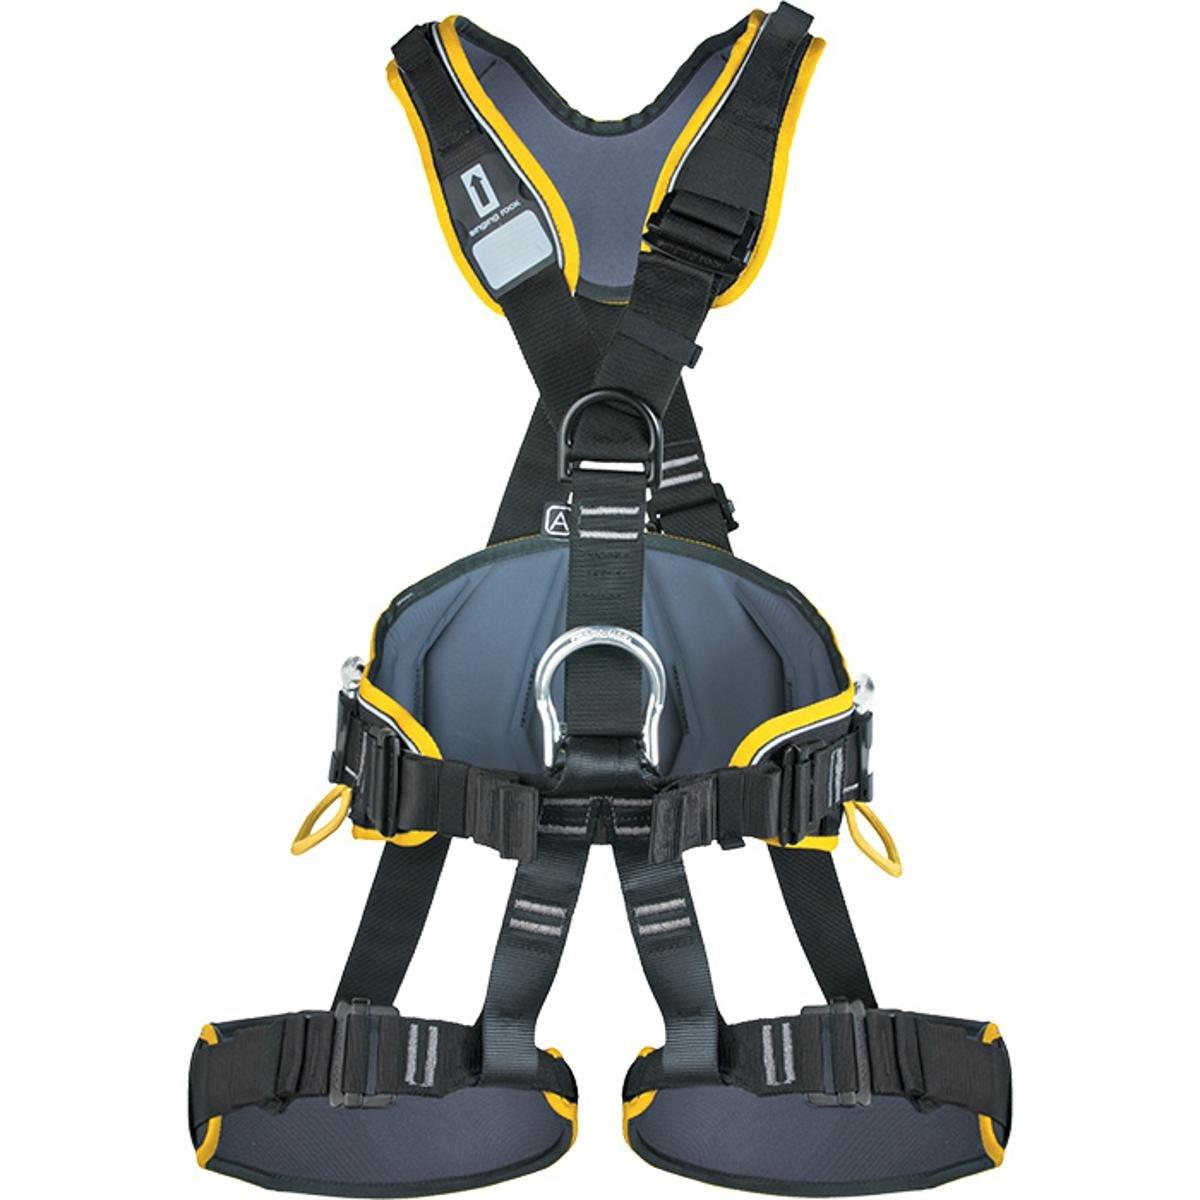 Profi Worker 3D Standard XL: Amazon.es: Deportes y aire libre